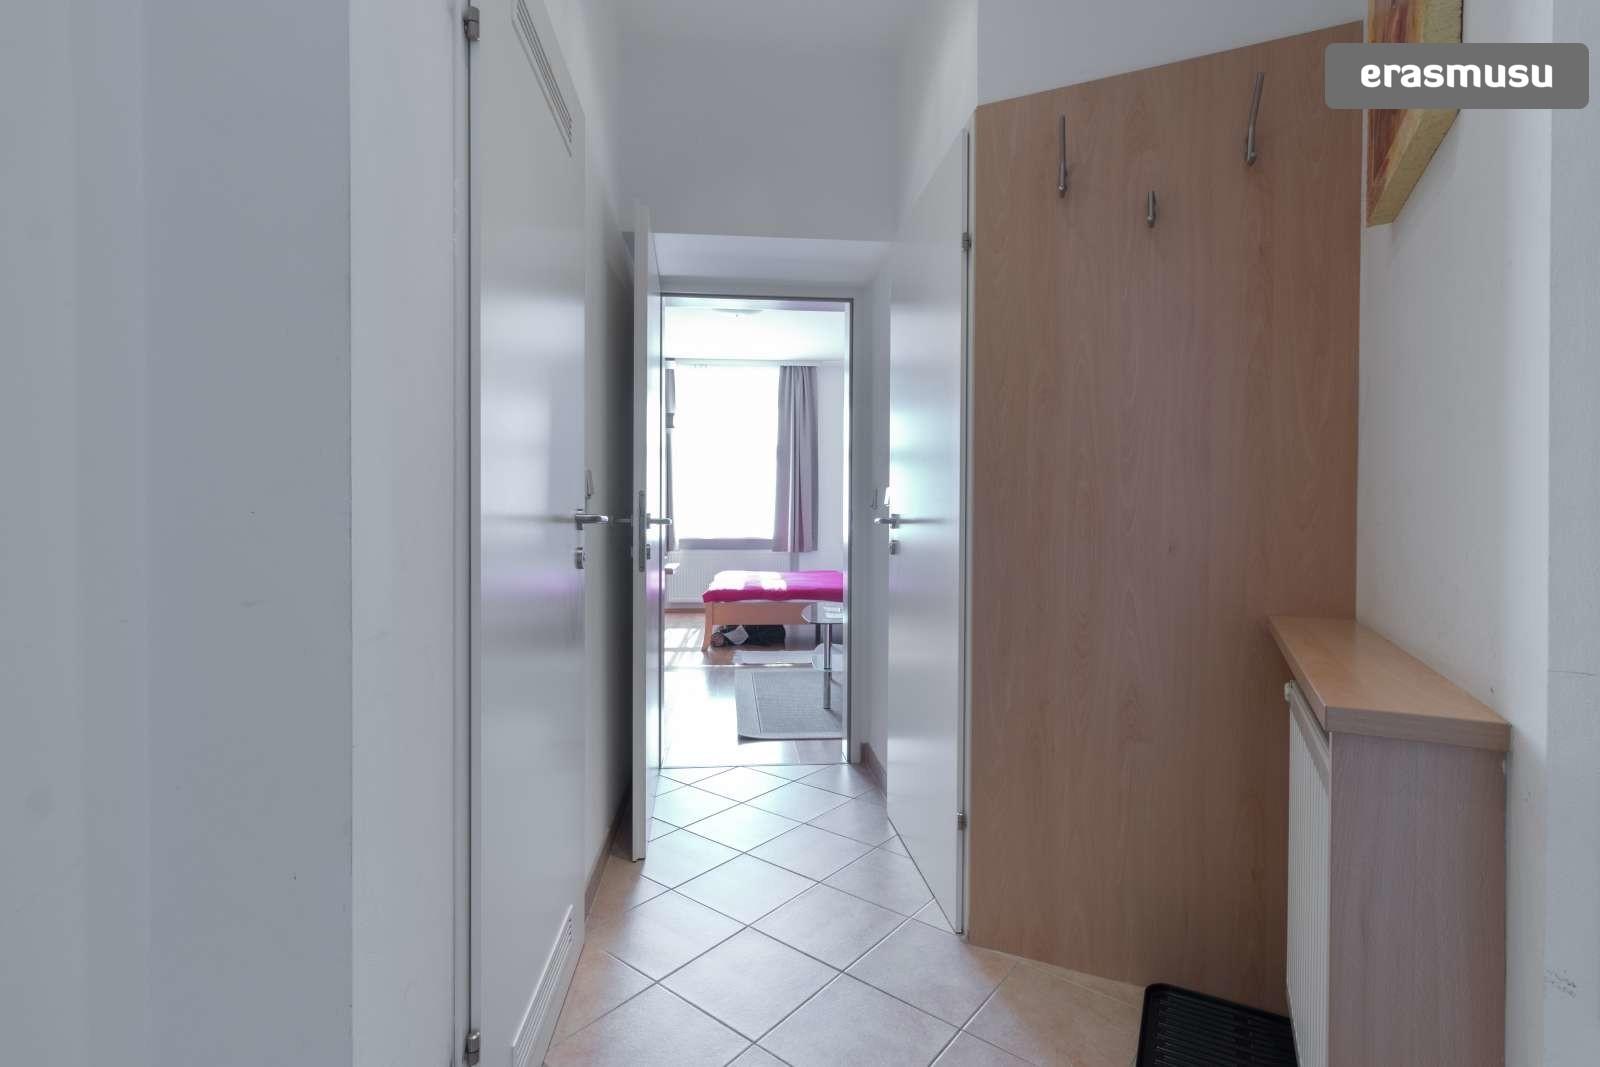 sunny-studio-apartment-rent-near-bohemian-prater-favoriten-e481a